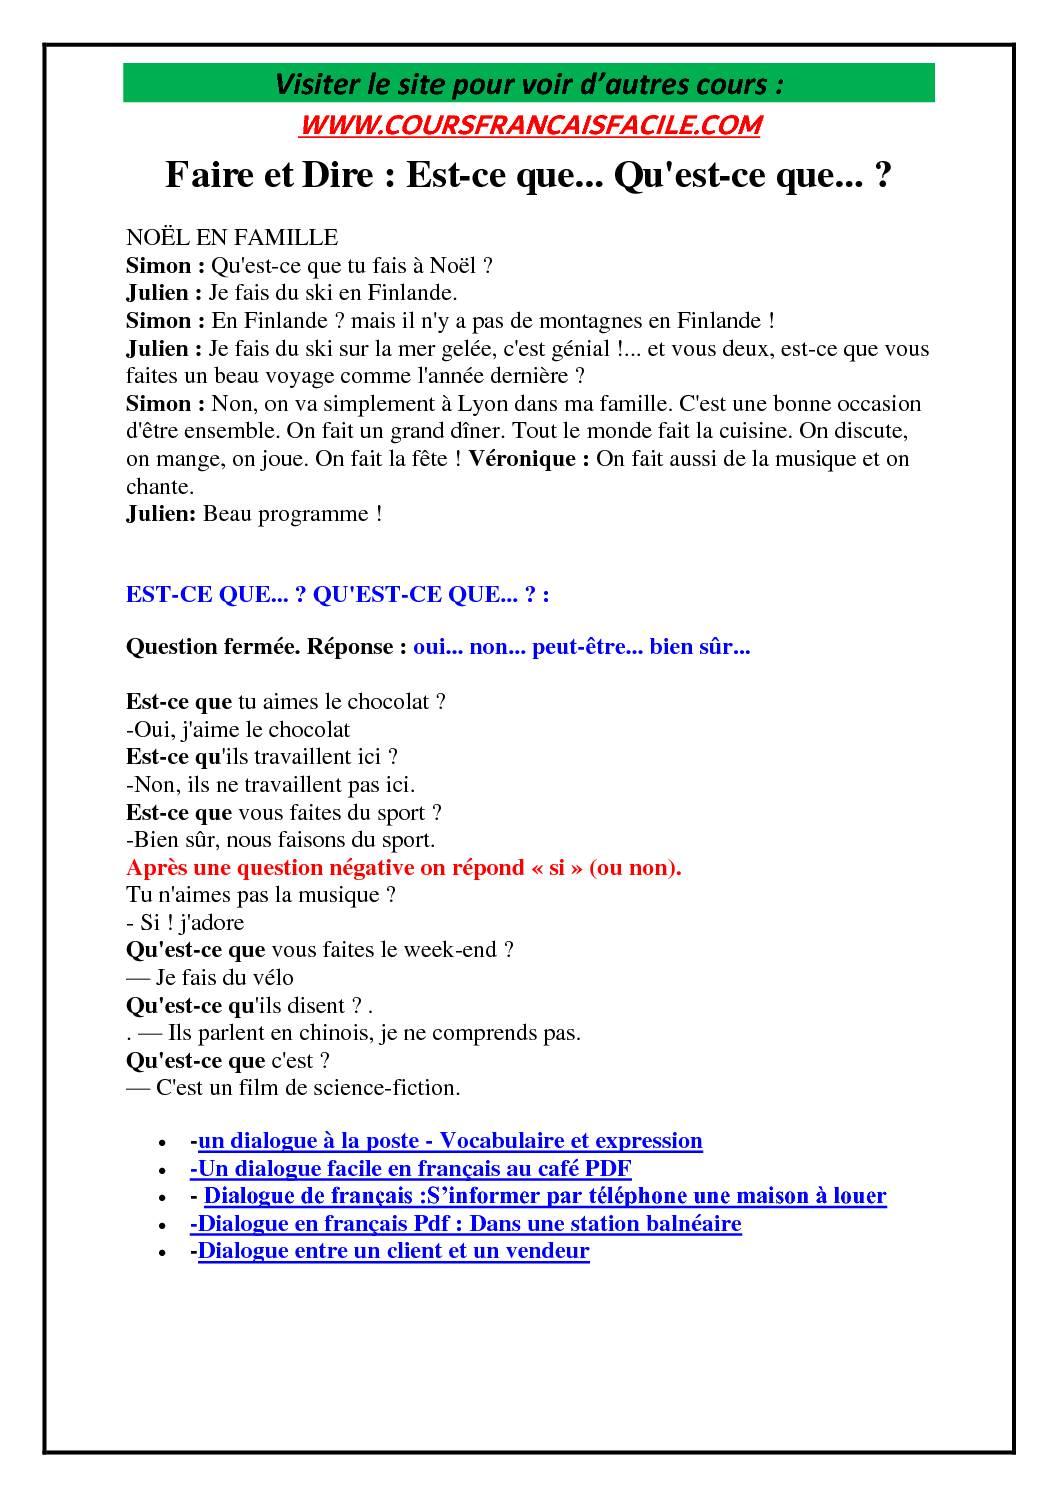 dialogue en français